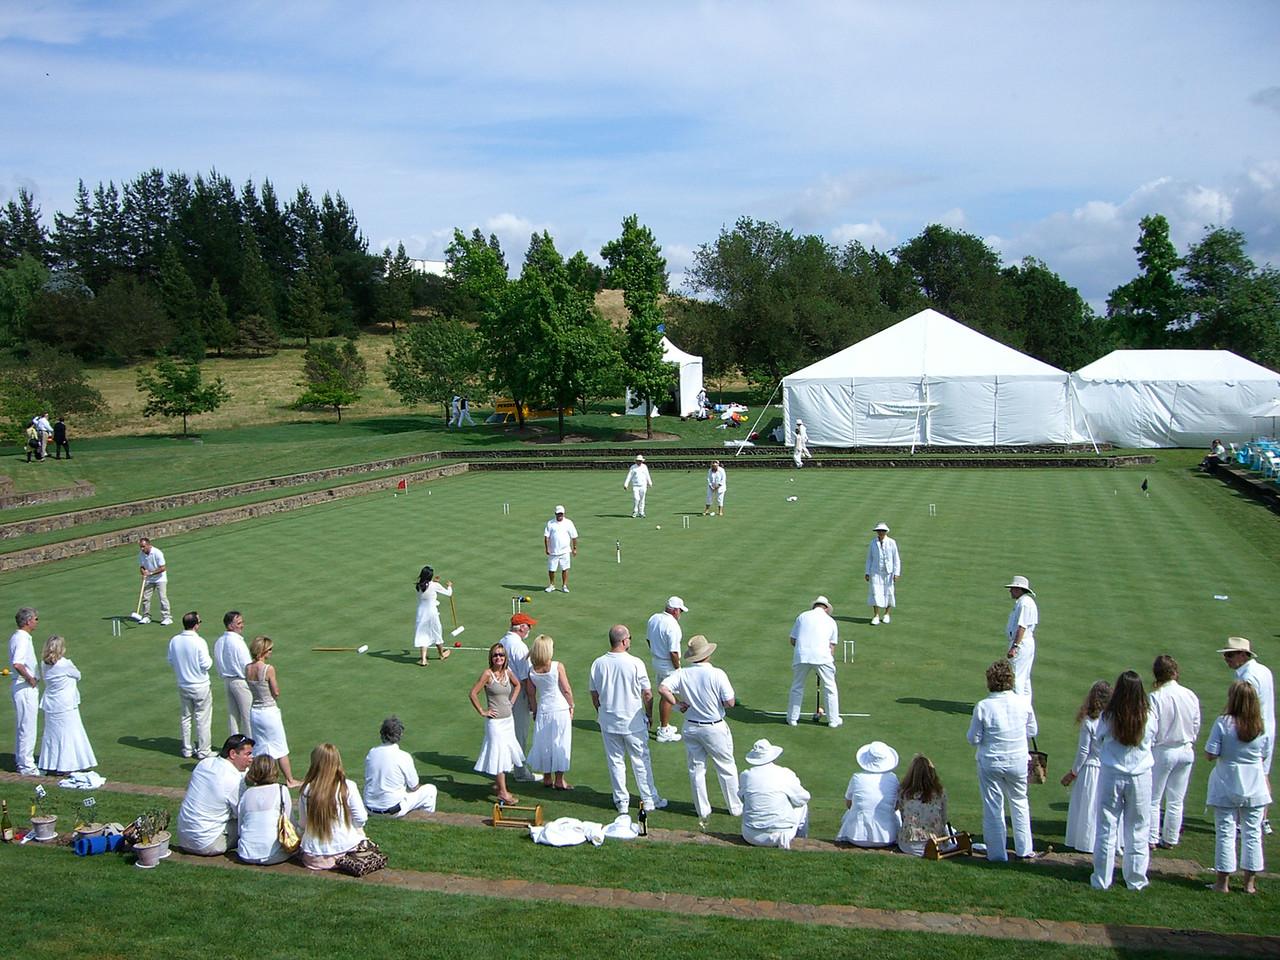 2006 05 20 Sat - Croquet players